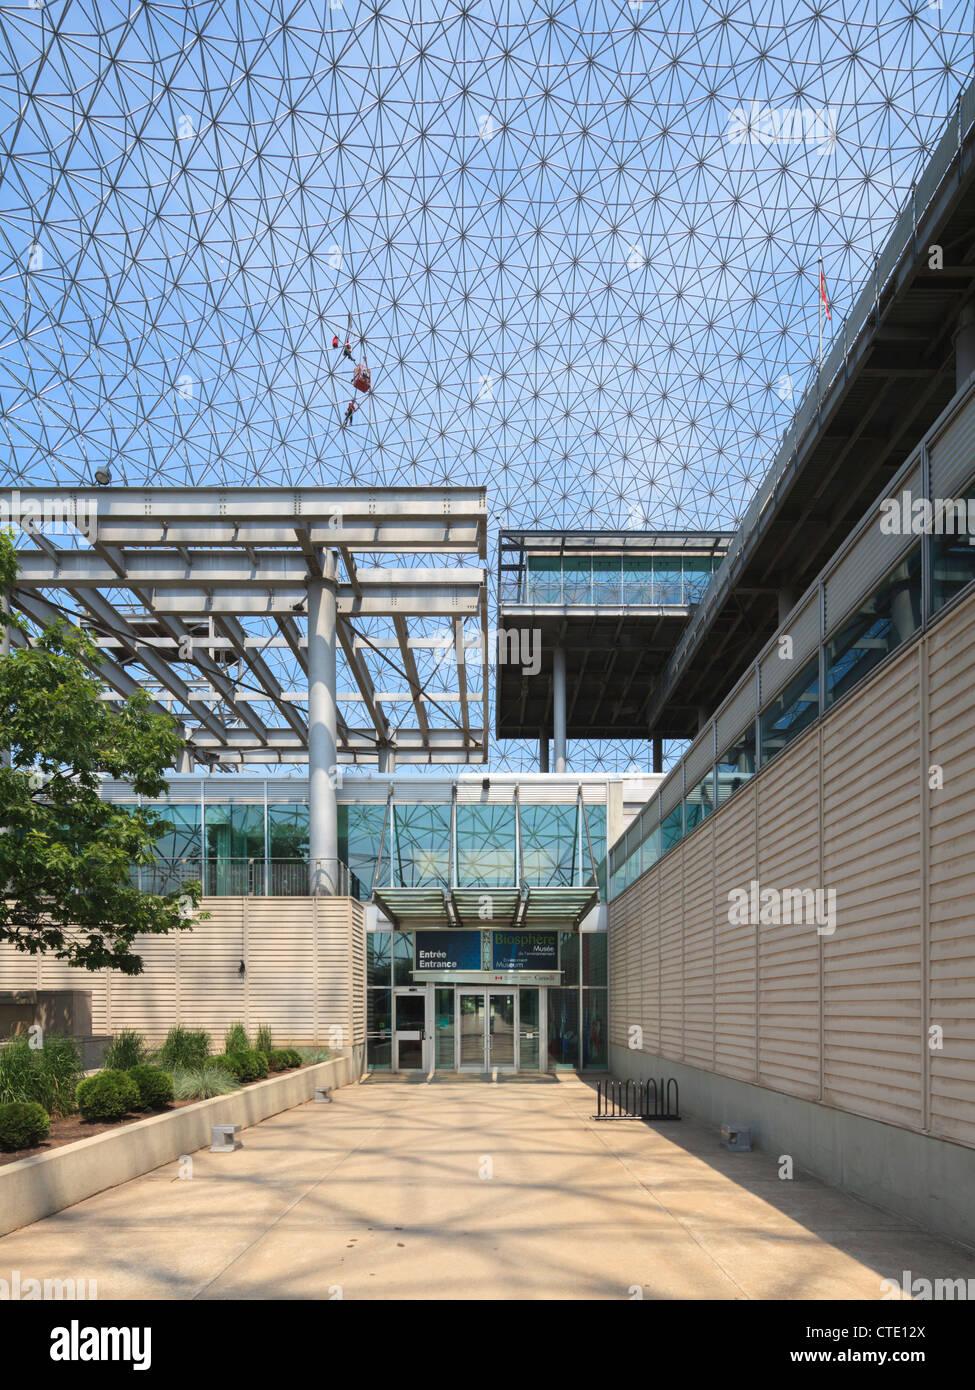 Montreal Biosphère - Stock Image